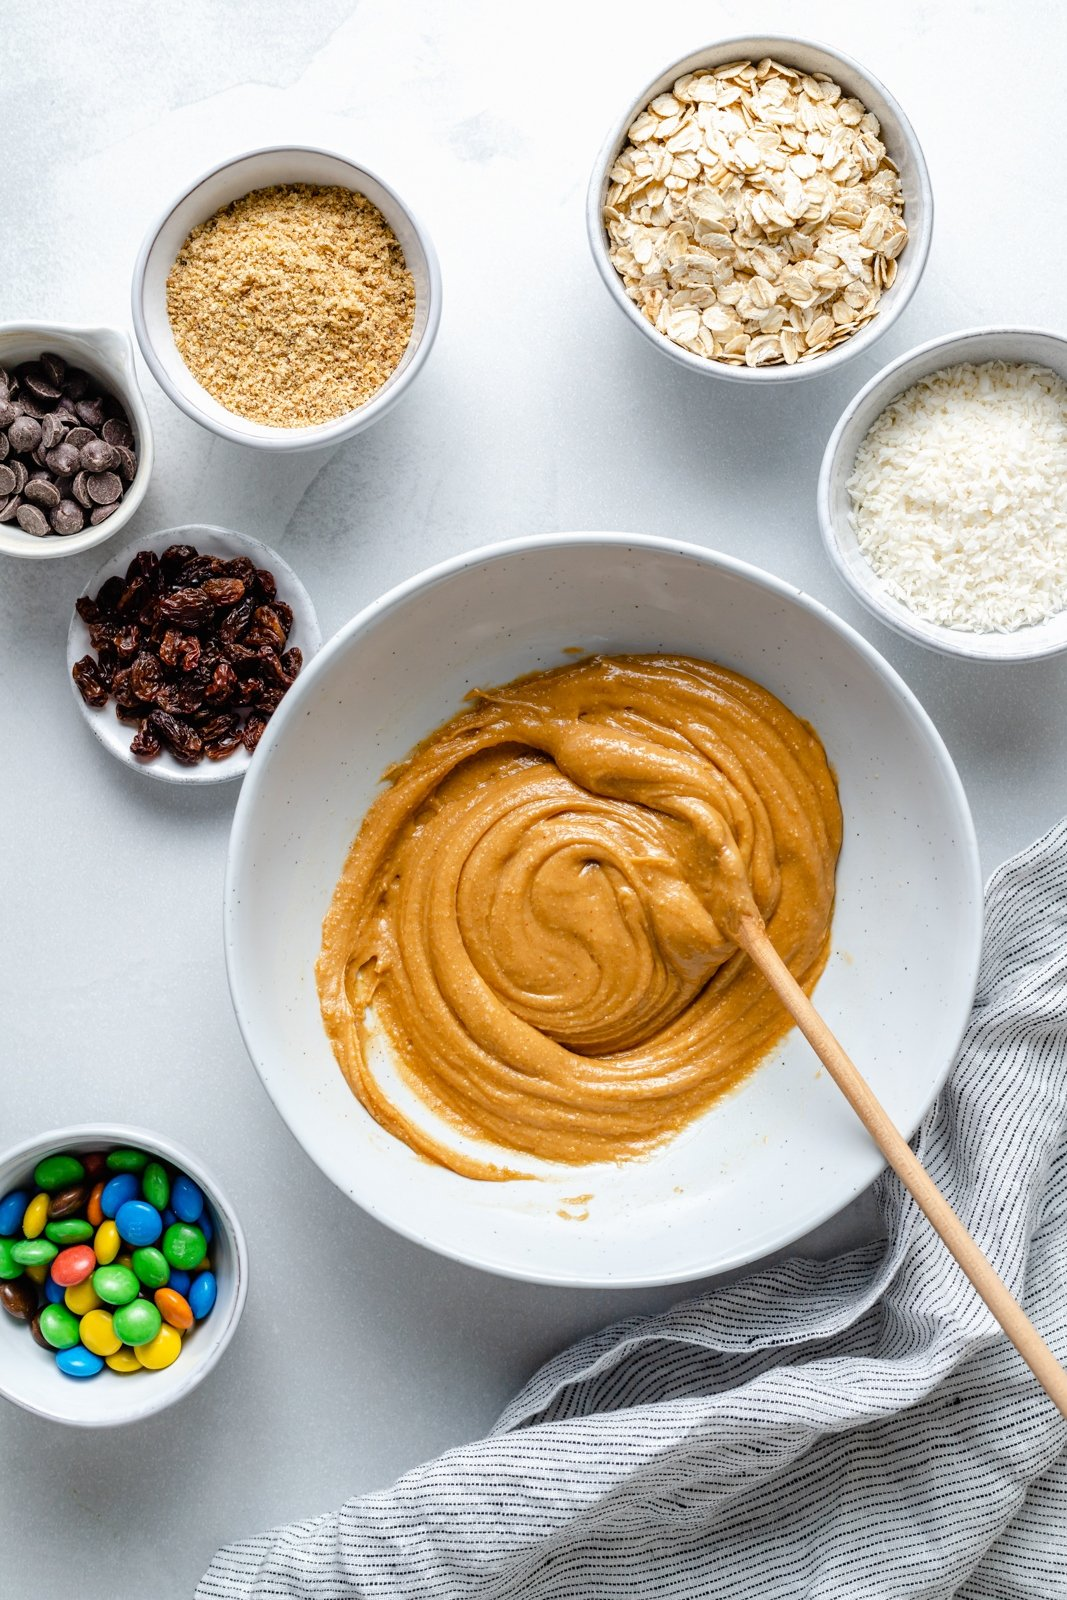 ingredients to make no bake monster cookie energy bites in bowls